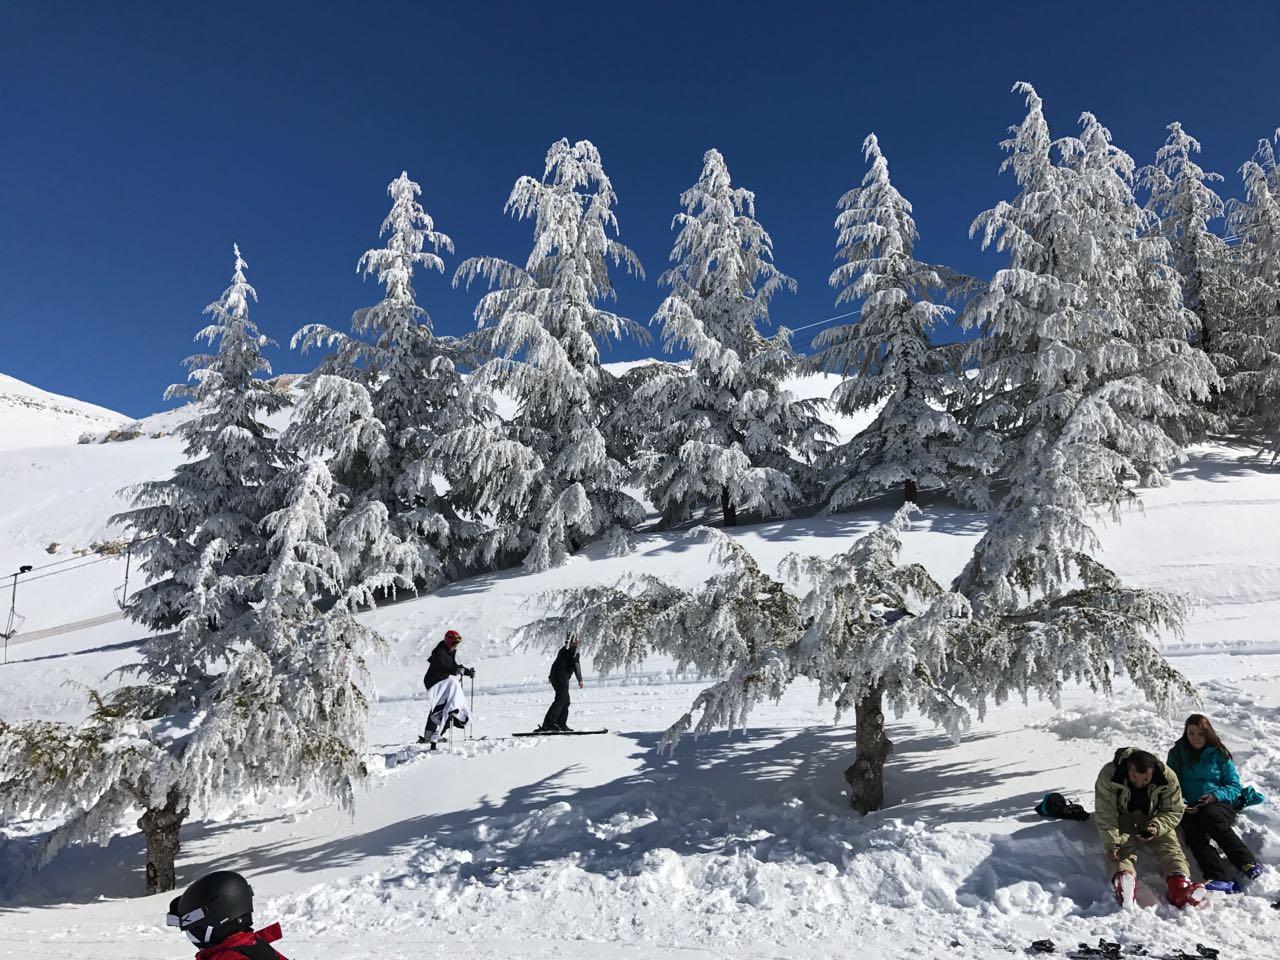 Cedars, Mzaar Ski Resort